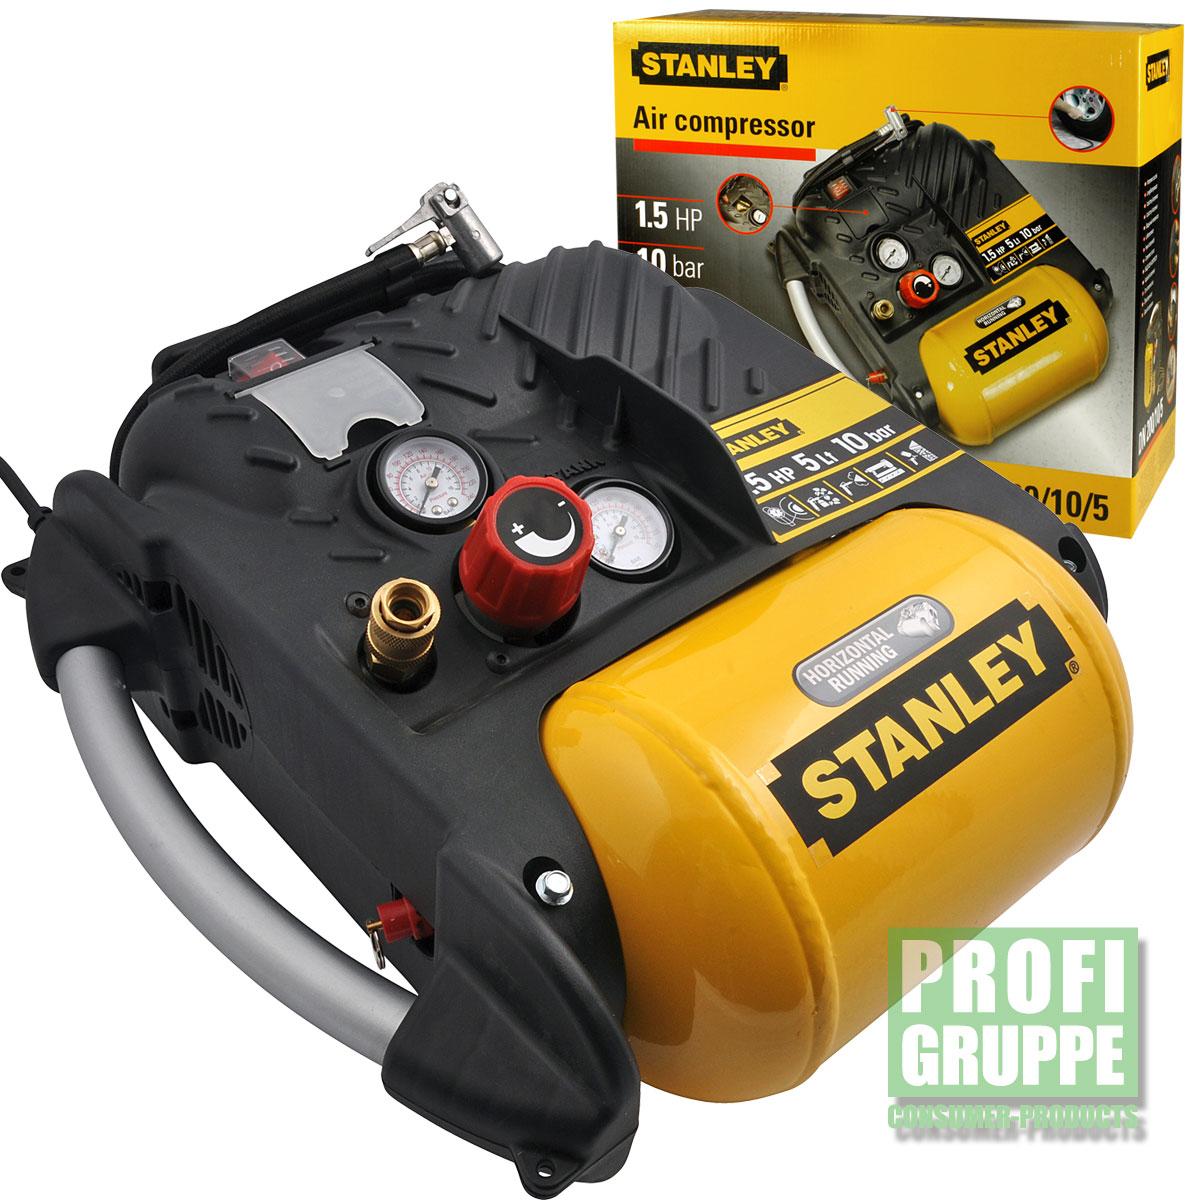 Stanley-Druckluft-Kompressor-1100W-10-bar-5-Liter-1-5-PS-Luftkompressor